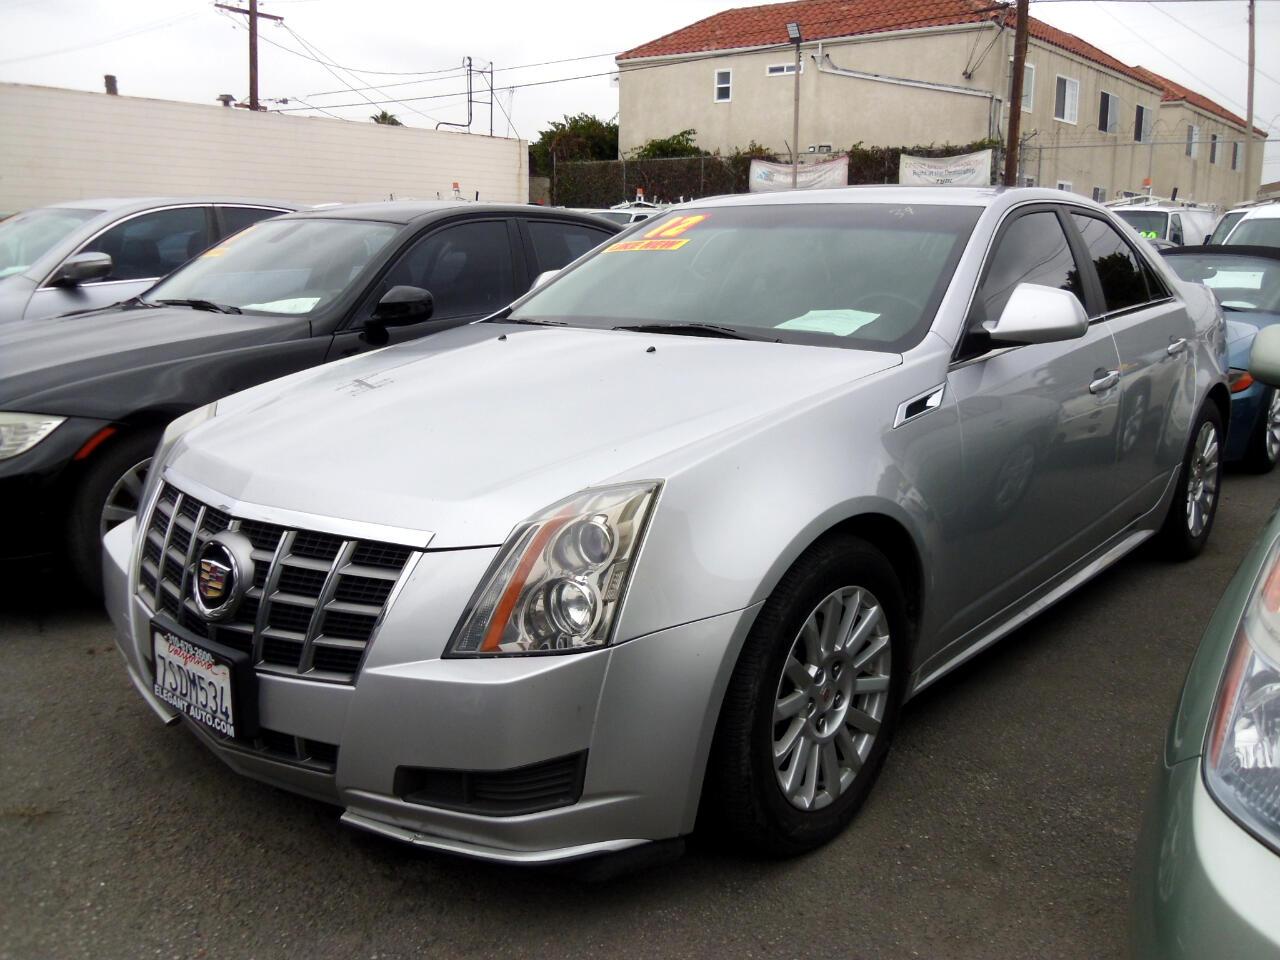 2012 Cadillac CTS Sedan 4dr Sdn 3.0L AWD